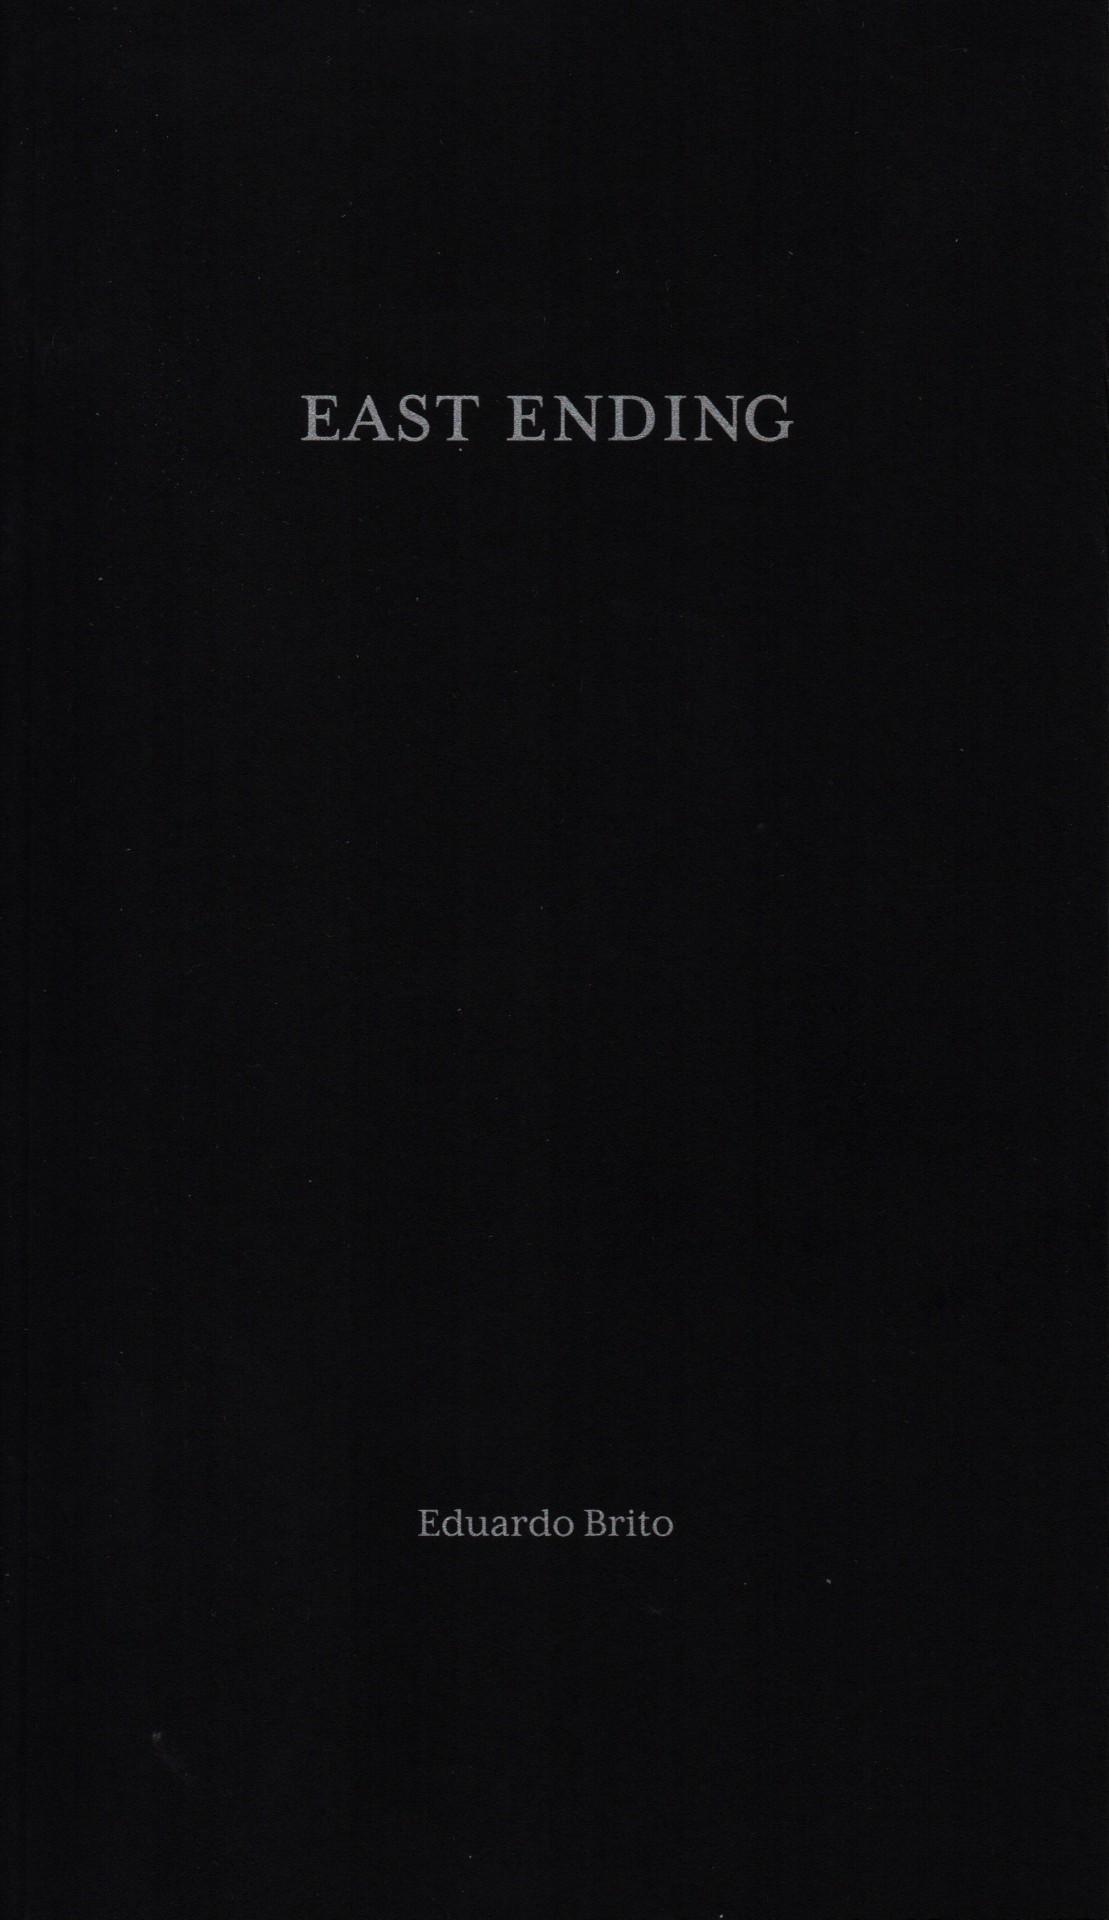 East Ending